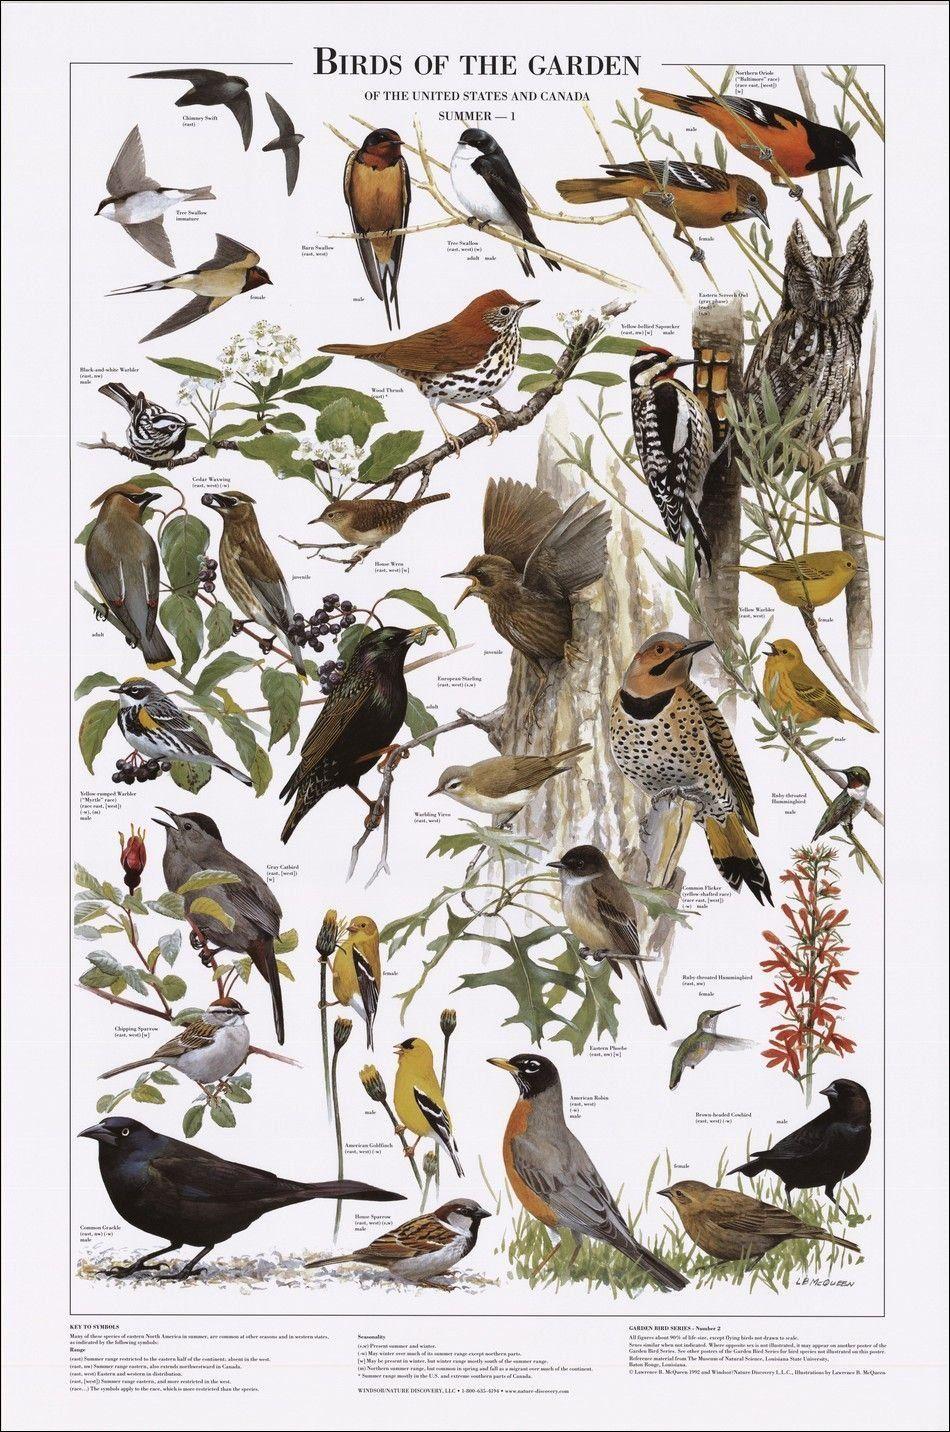 Wildlife Posters Fish Posters Nature Posters Beautiful Birds Wild Birds Pet Birds